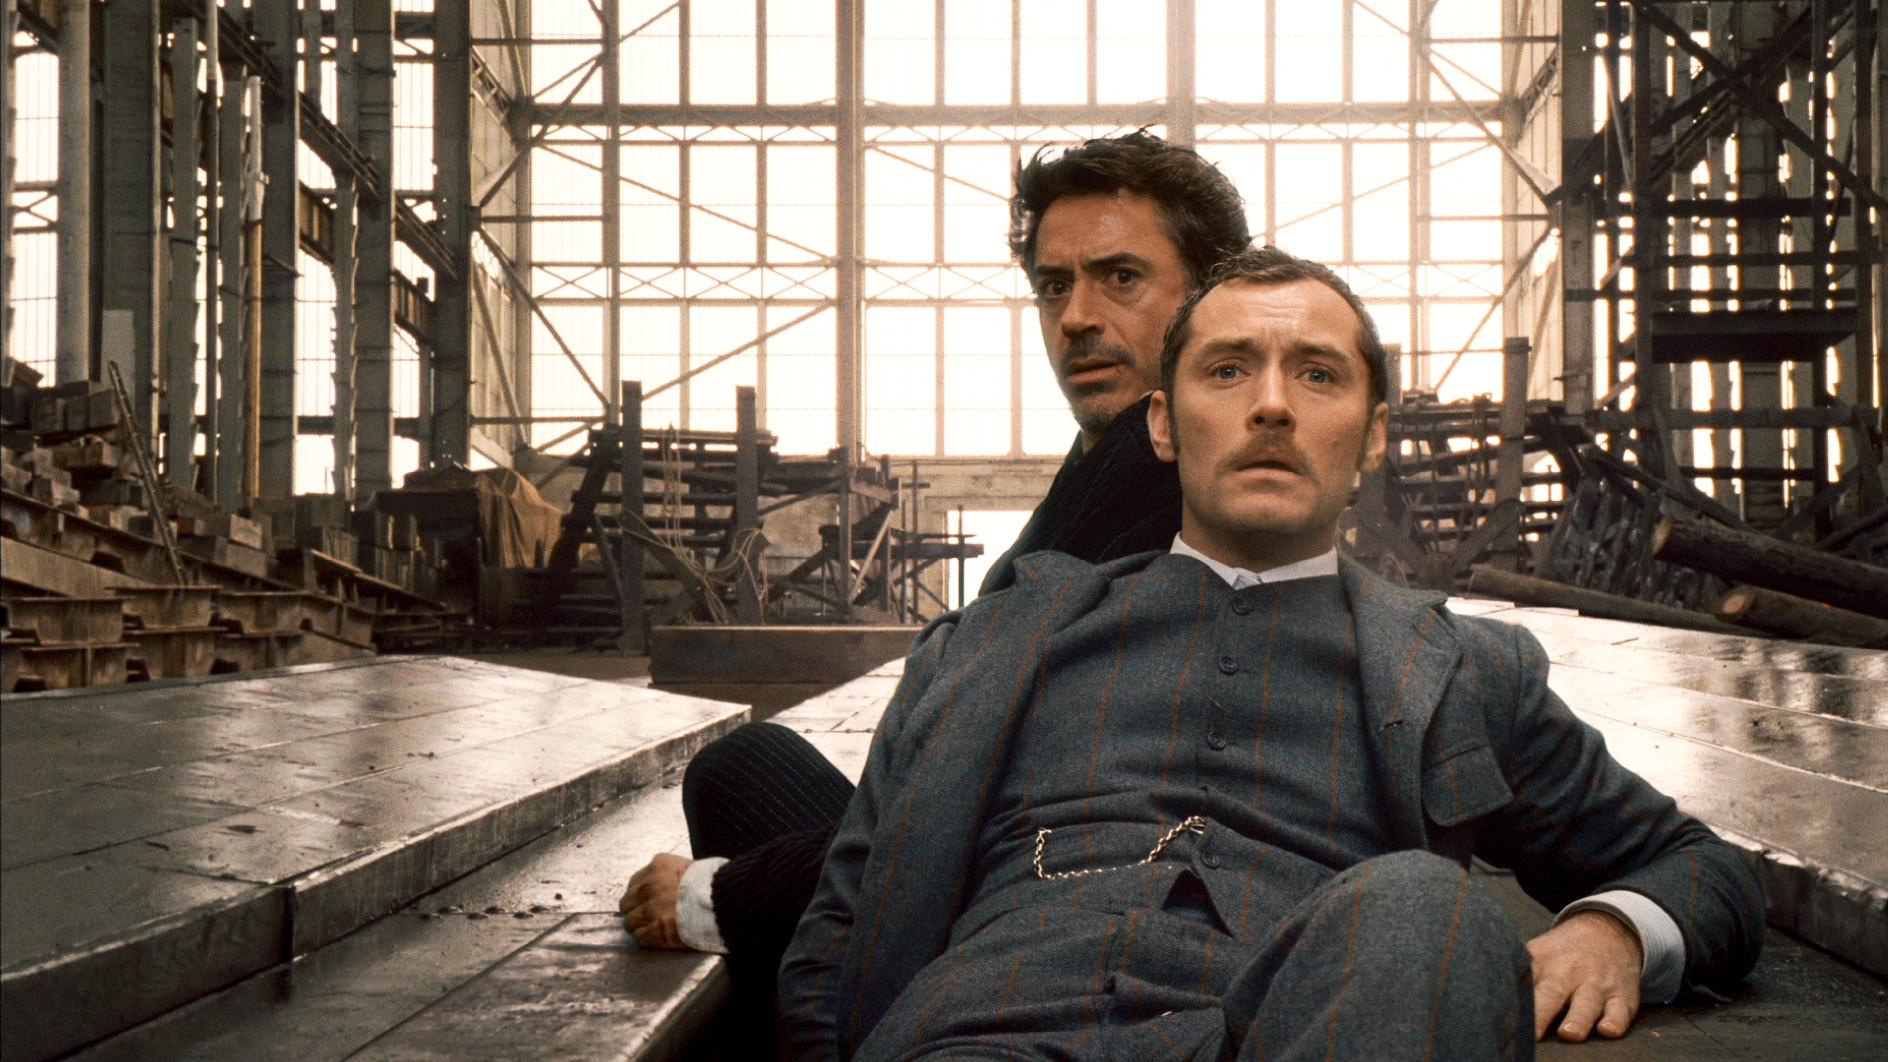 'Sherlock Holmes' | Warner Bros.